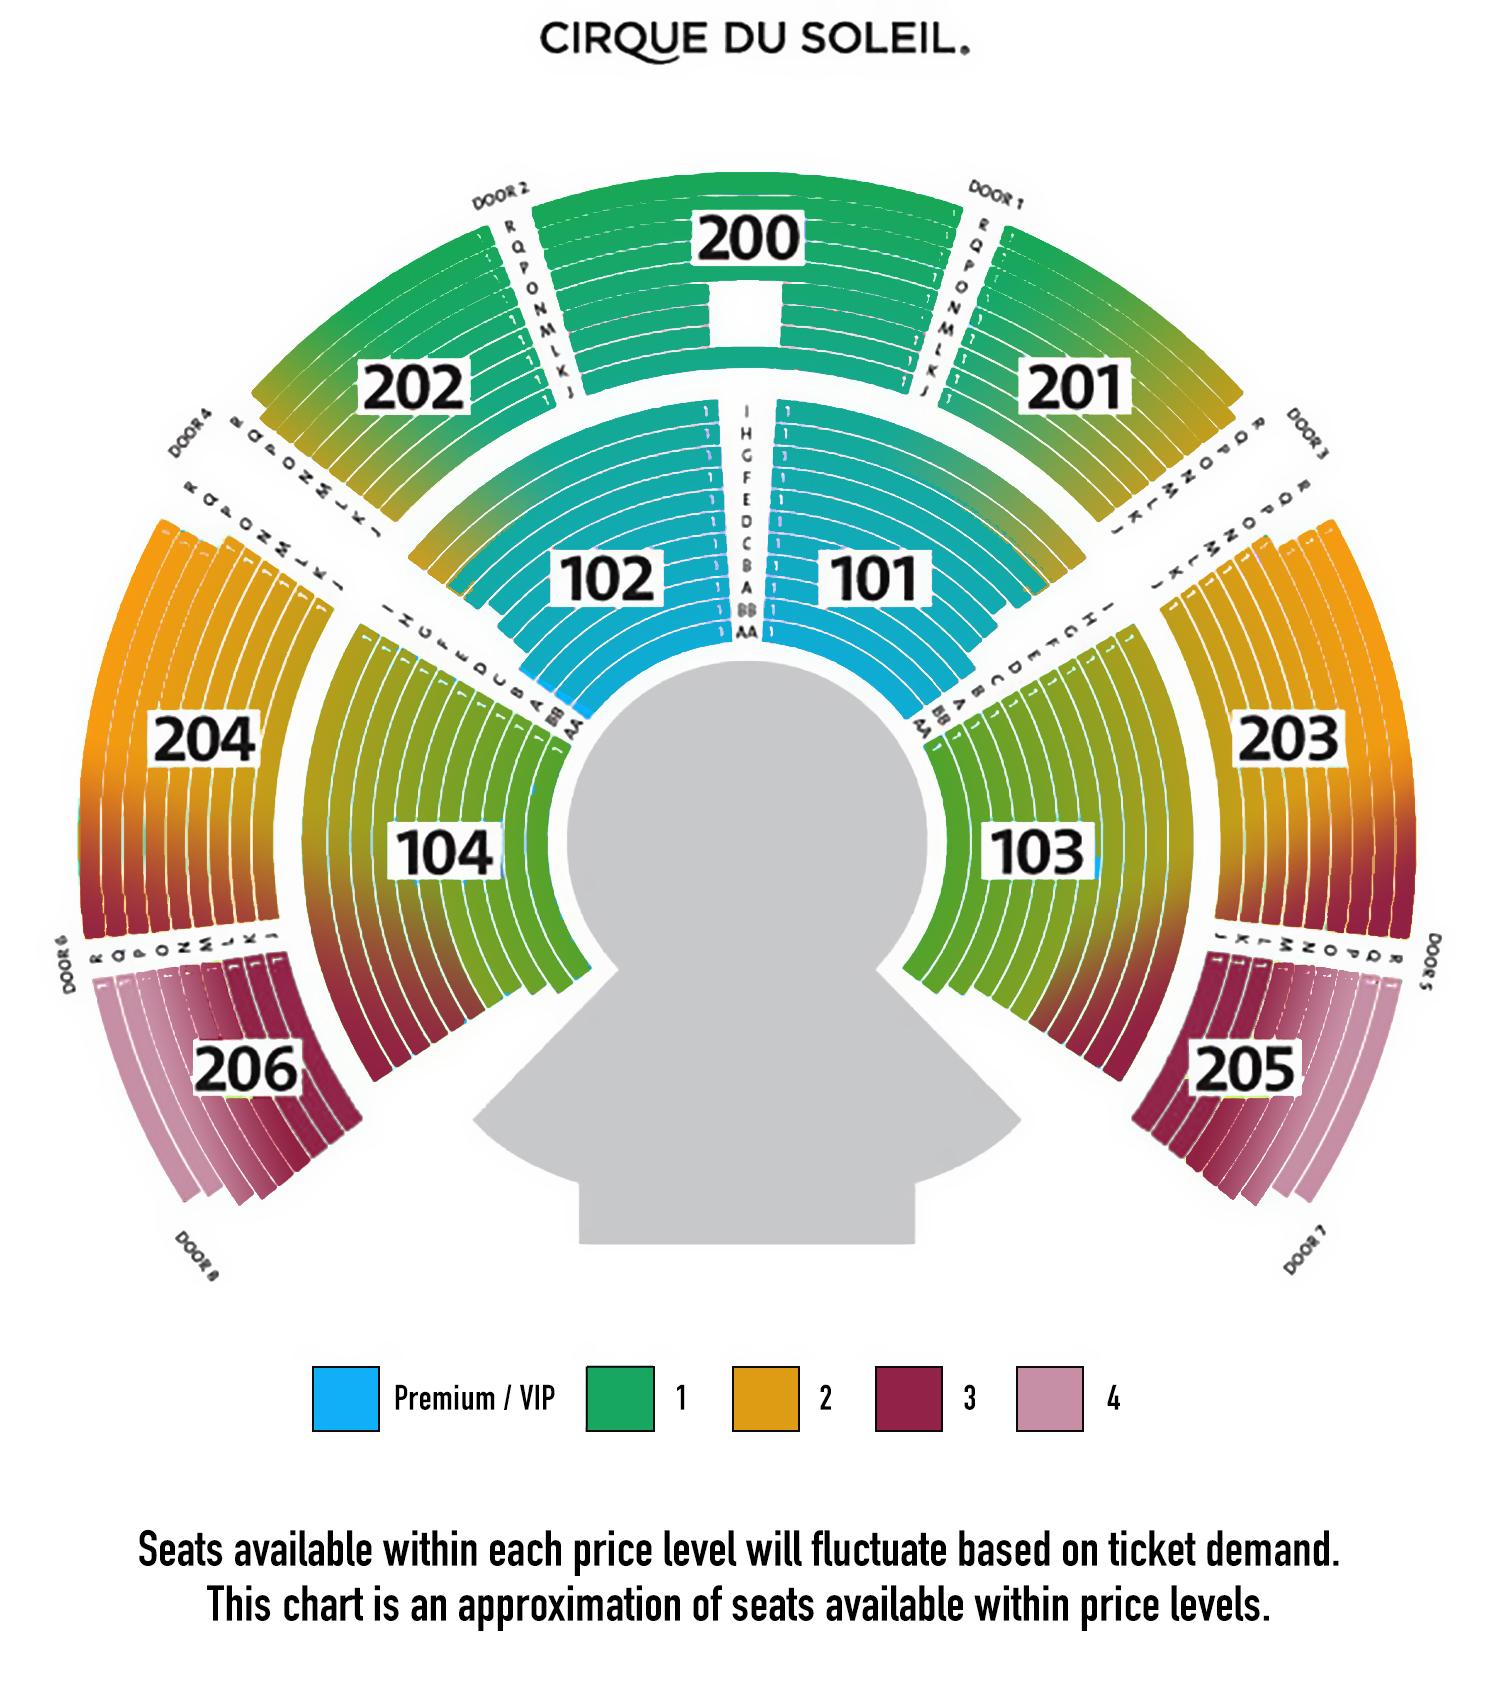 dodgers stadium seating chart Parlo buenacocina